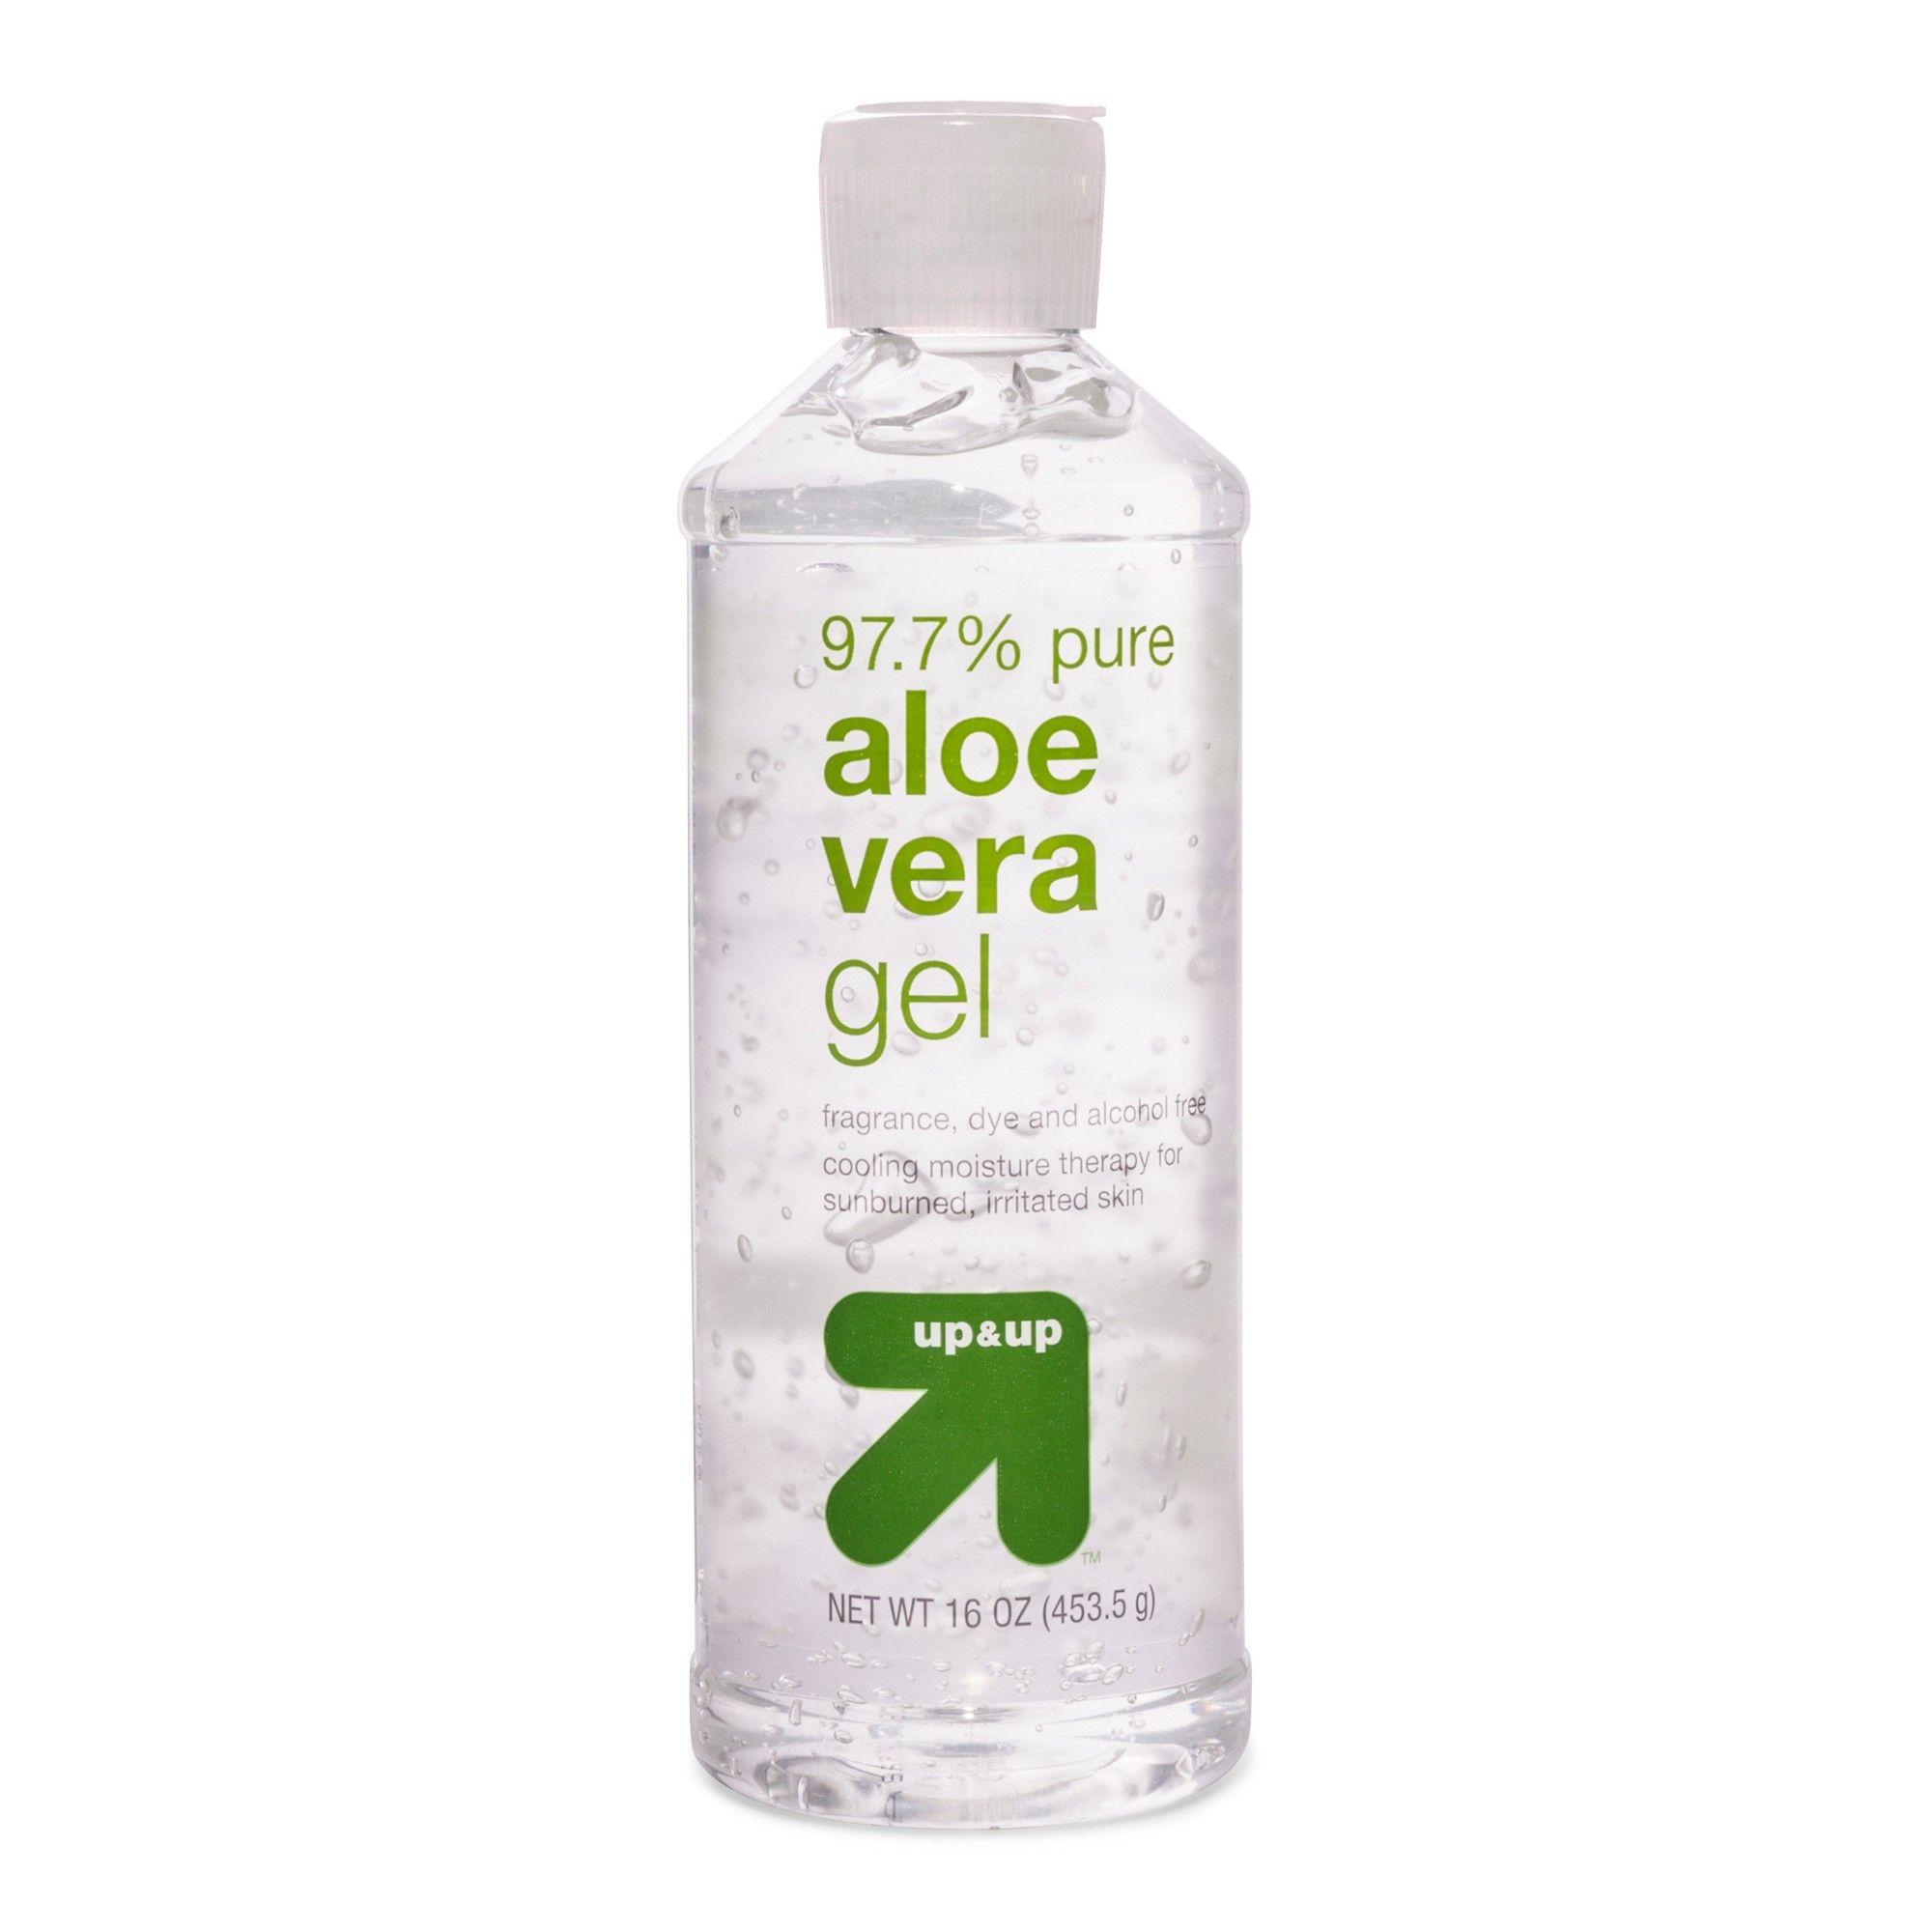 Clear Aloe Vera Gel 16oz Up Up Aloe Vera Gel Aloe Vera